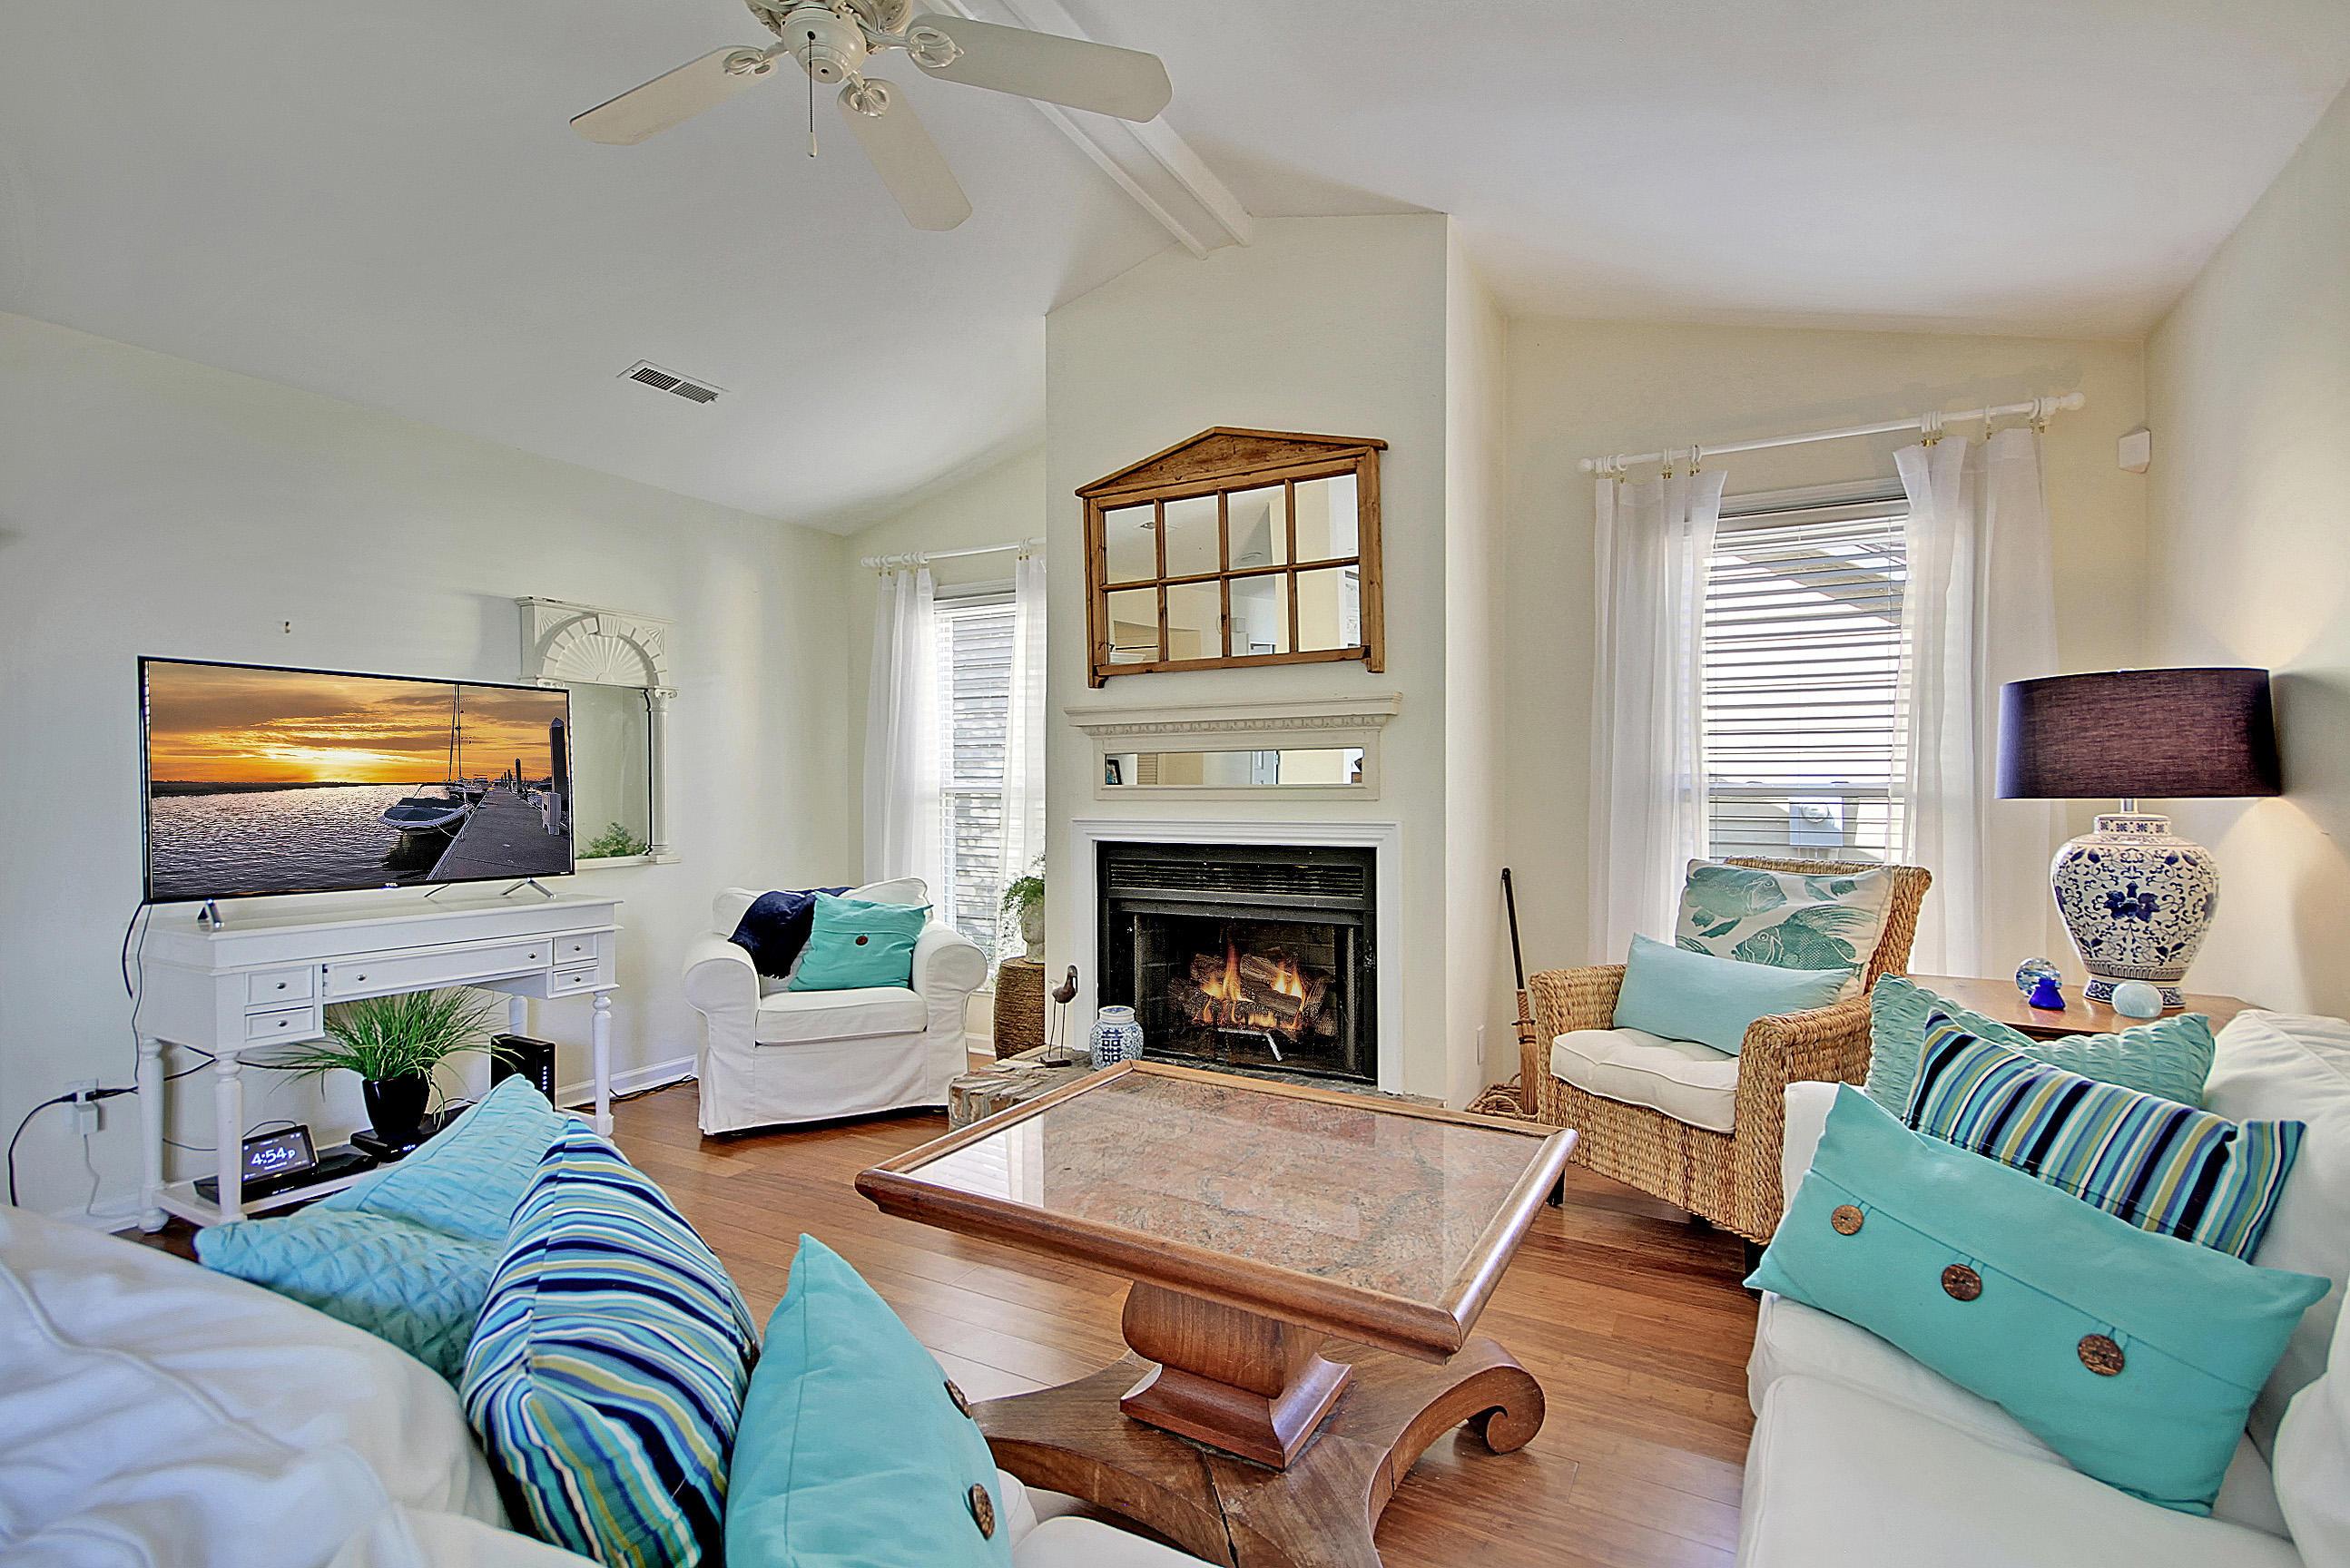 Pirates Cove Homes For Sale - 1492 Ketch, Mount Pleasant, SC - 35